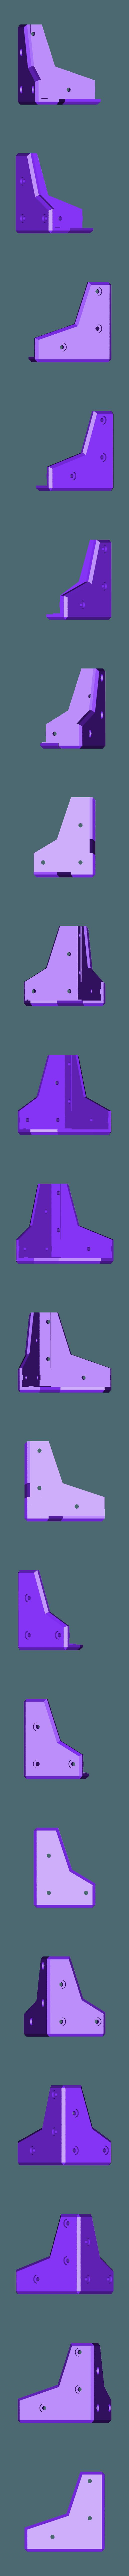 2020-Corner-Long-Delta.stl Download free STL file 2020 Profile Aluminum 3D Printable Erector Set • 3D printer model, adamjvr